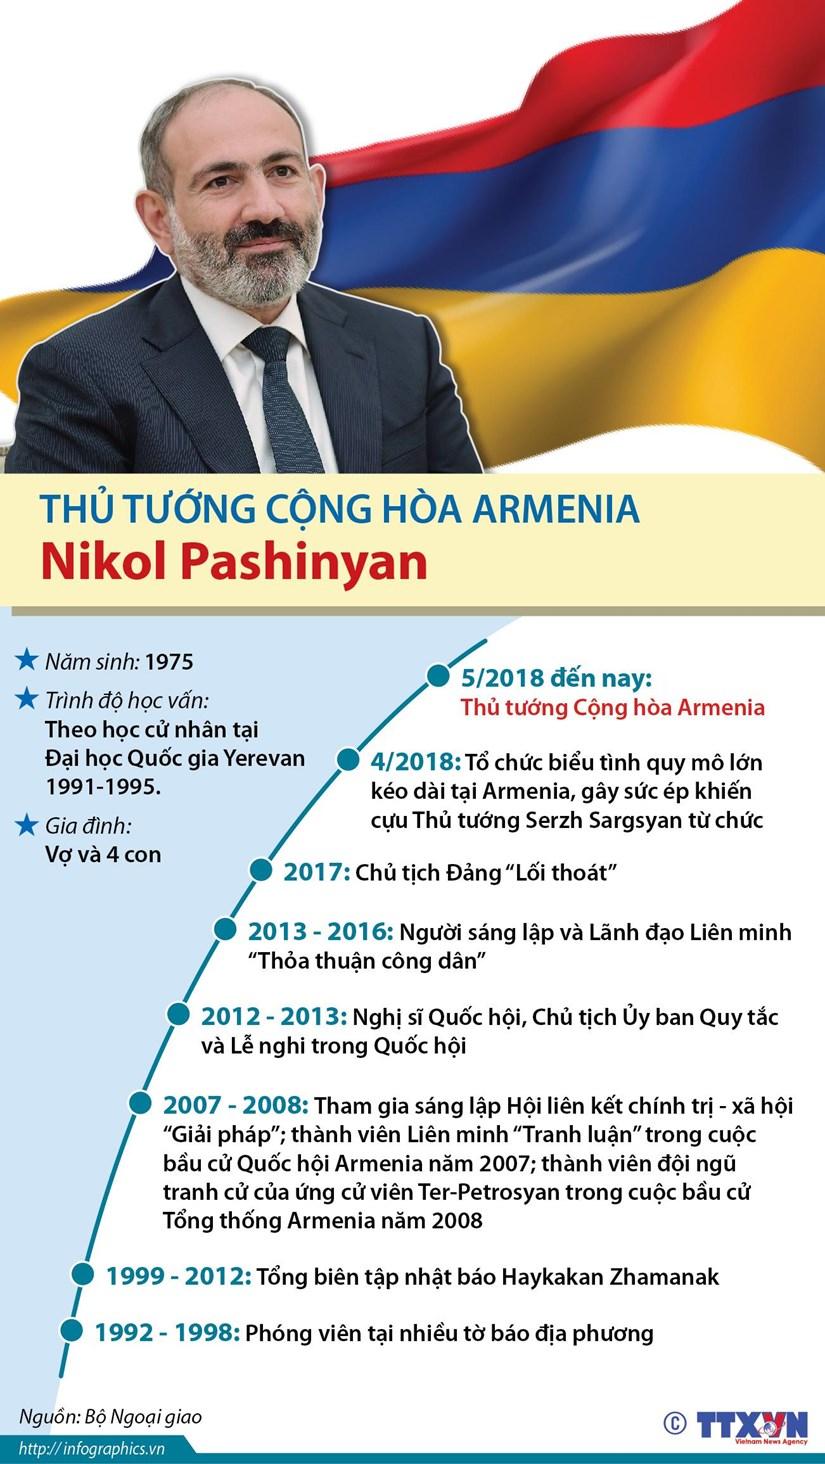 [Infographic] Thu tuong Cong hoa Armenia Nikol Pashinyan hinh anh 1